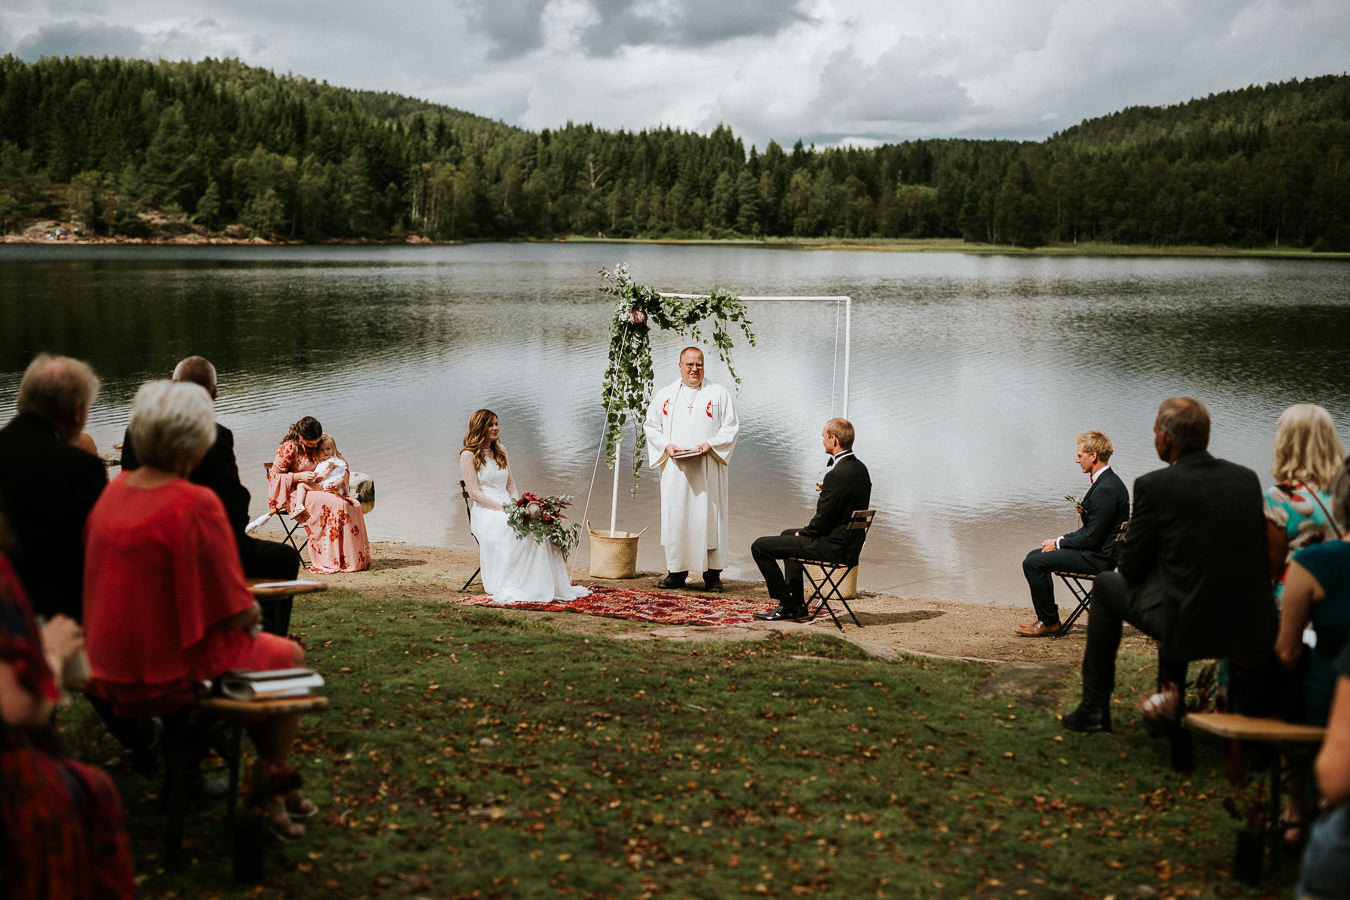 Bryllup-Lageret-Tofte-bryllupsfotograf-119.jpg